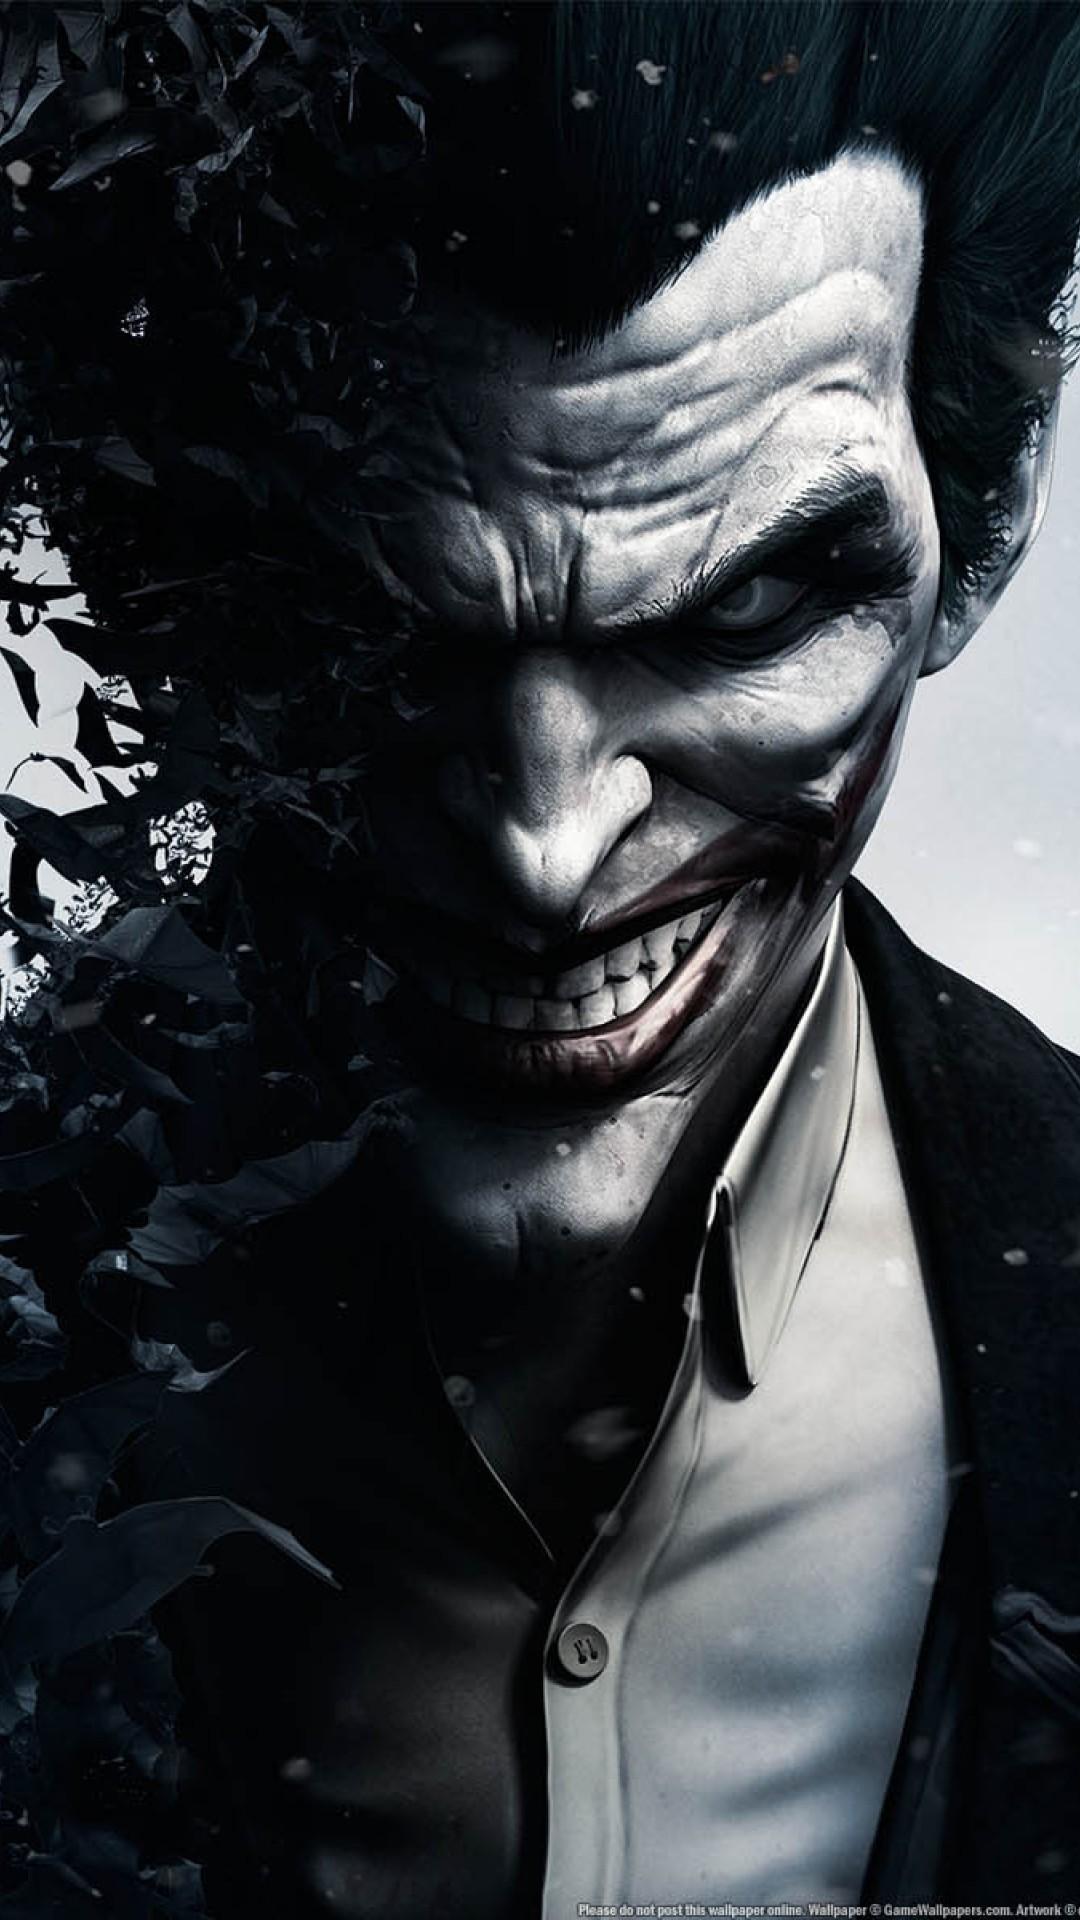 Download Joker 4k Hd Wallpaper For Desktop And Mobiles